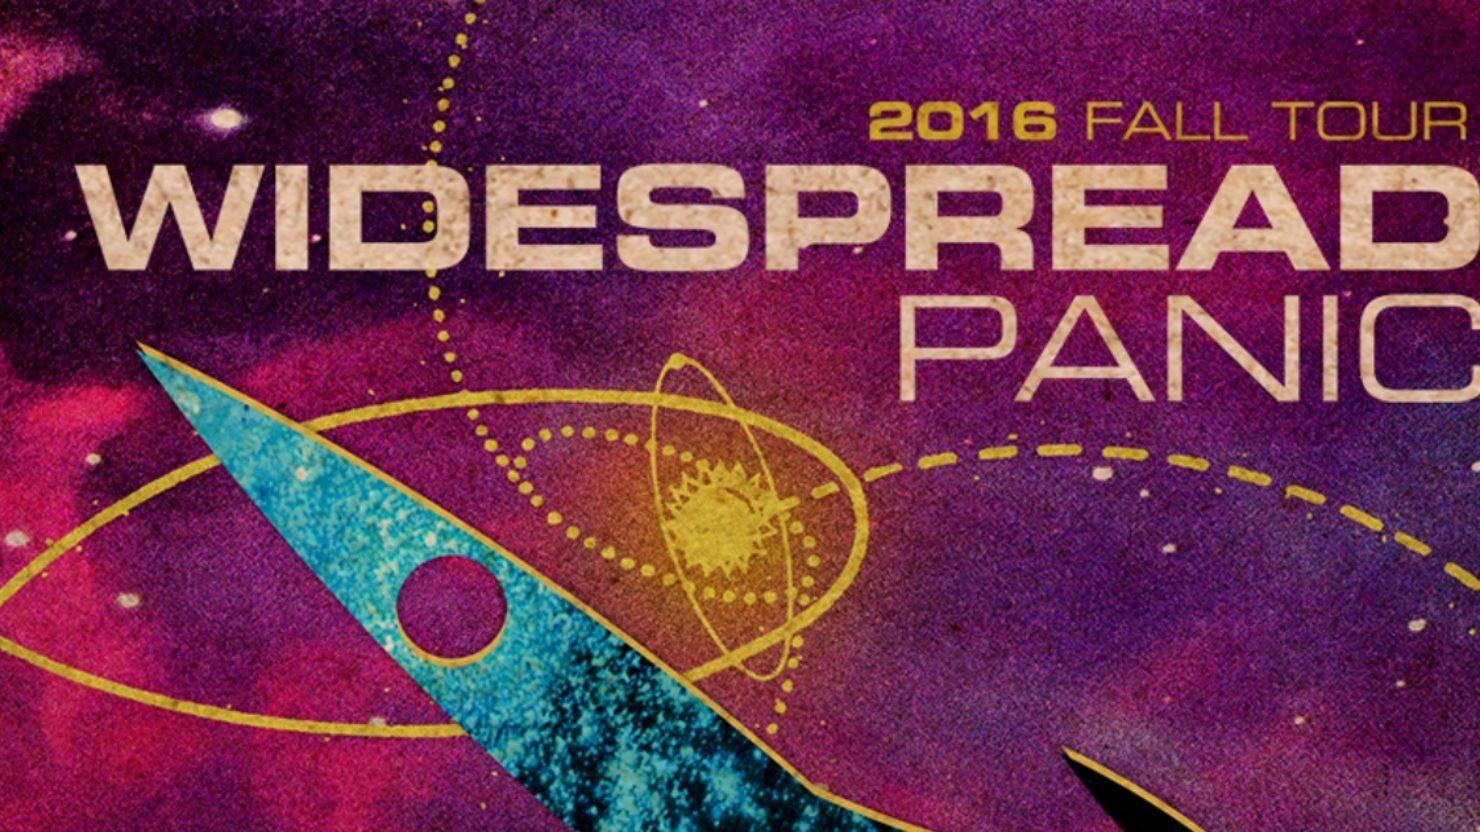 Widespread Panic 2016 Tour Dates